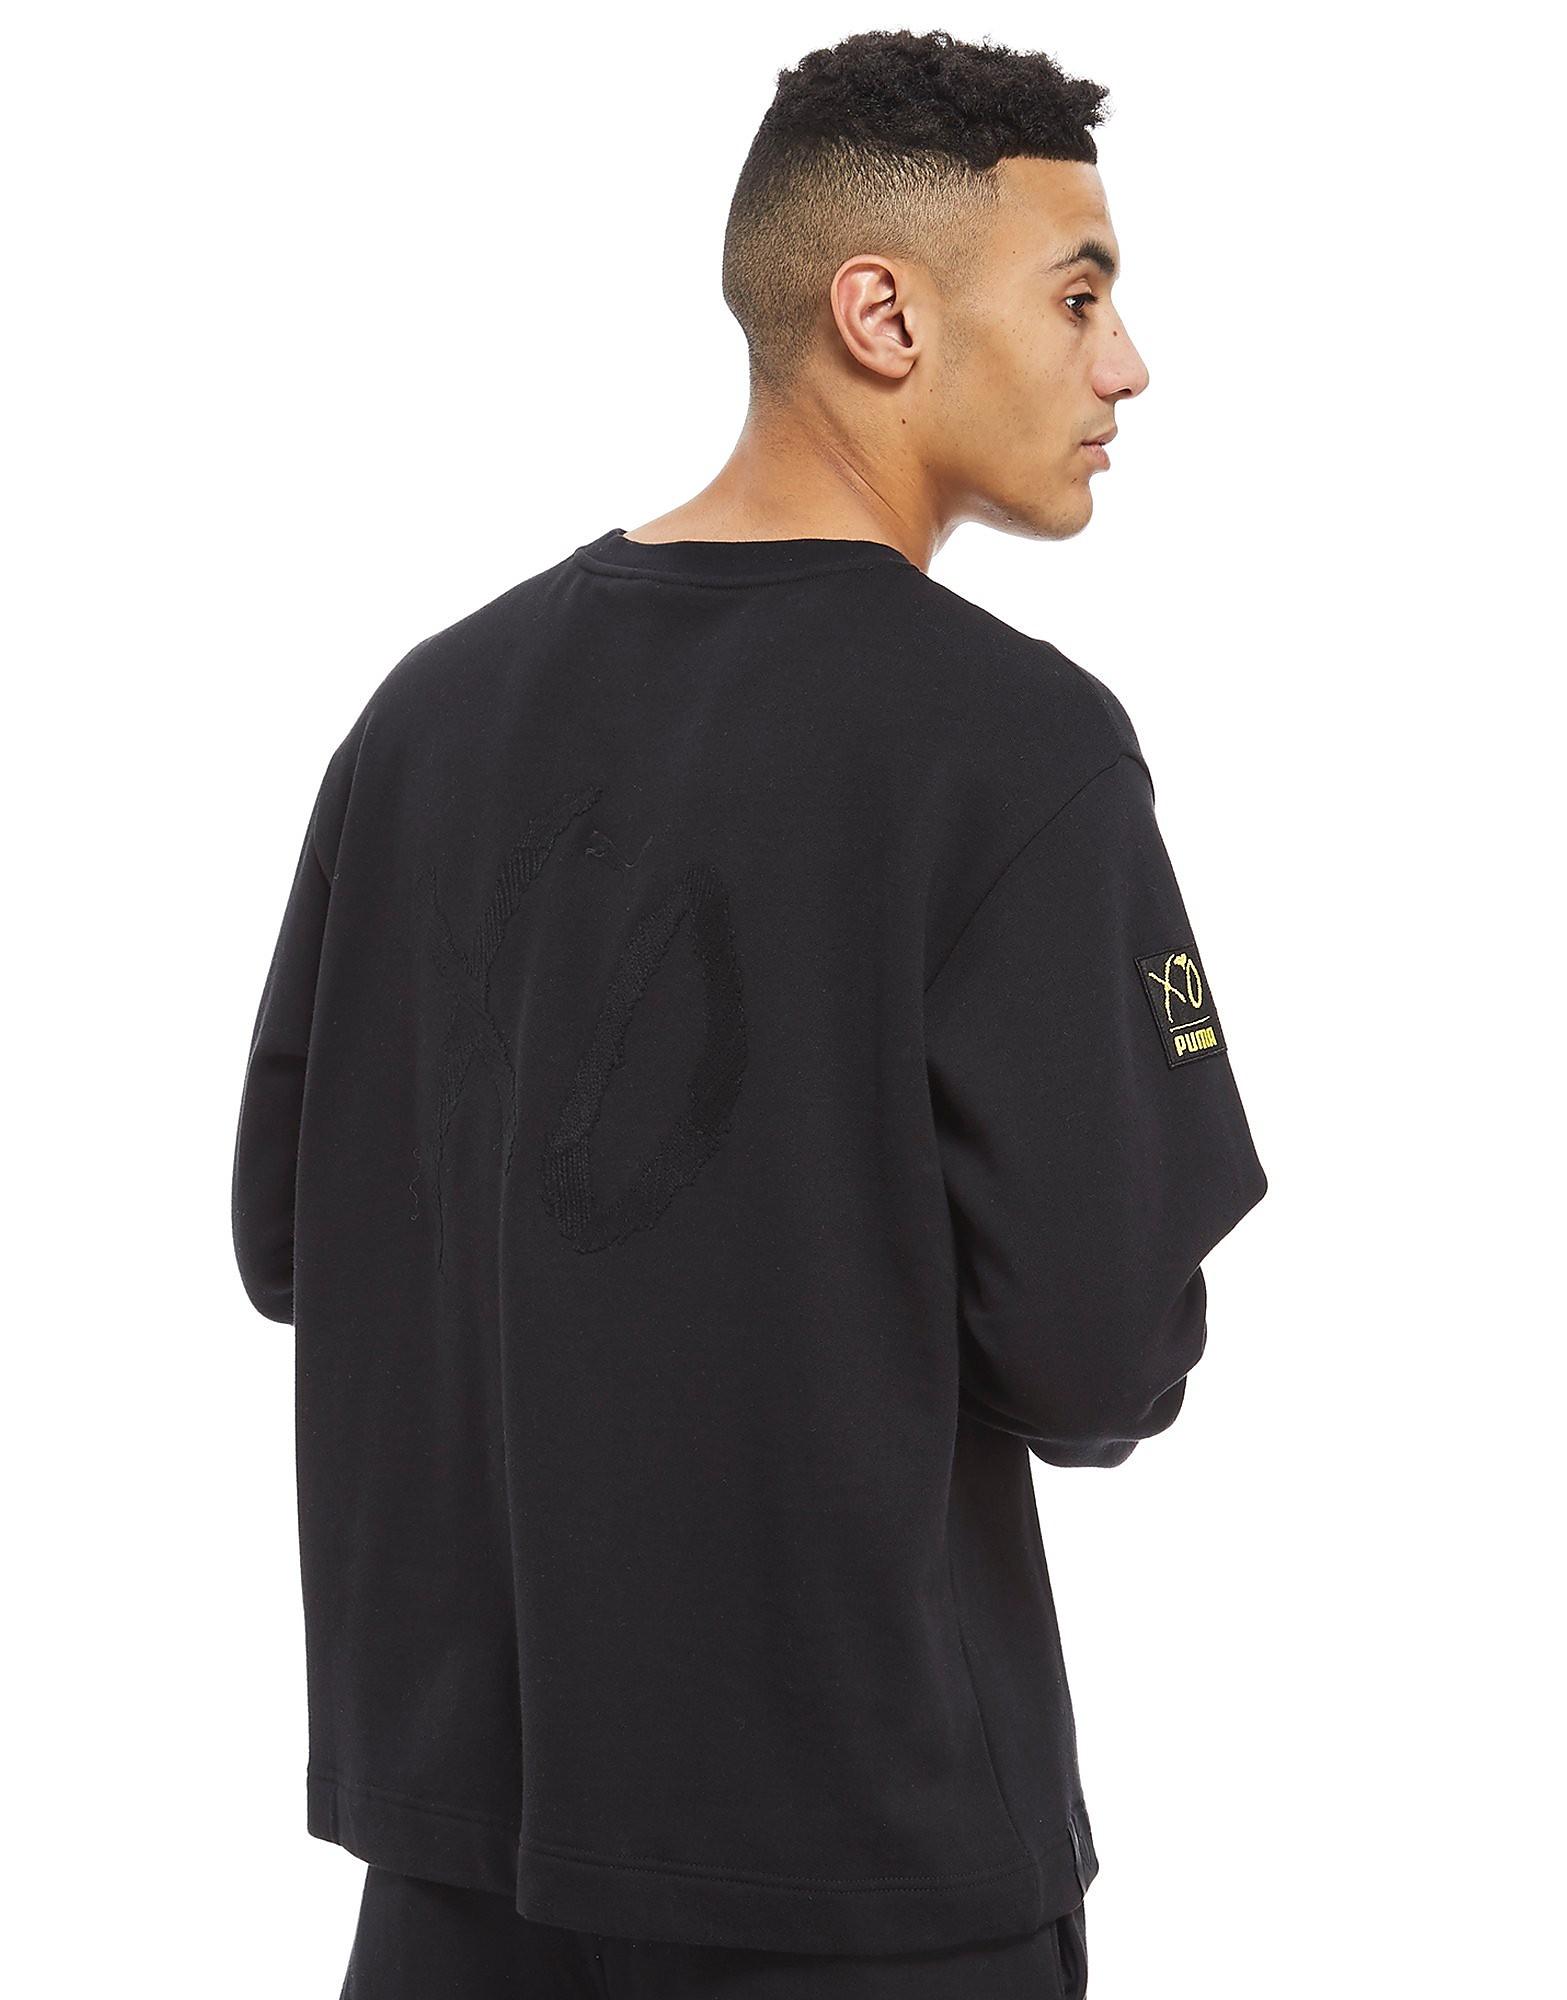 PUMA XO Crew Sweatshirt